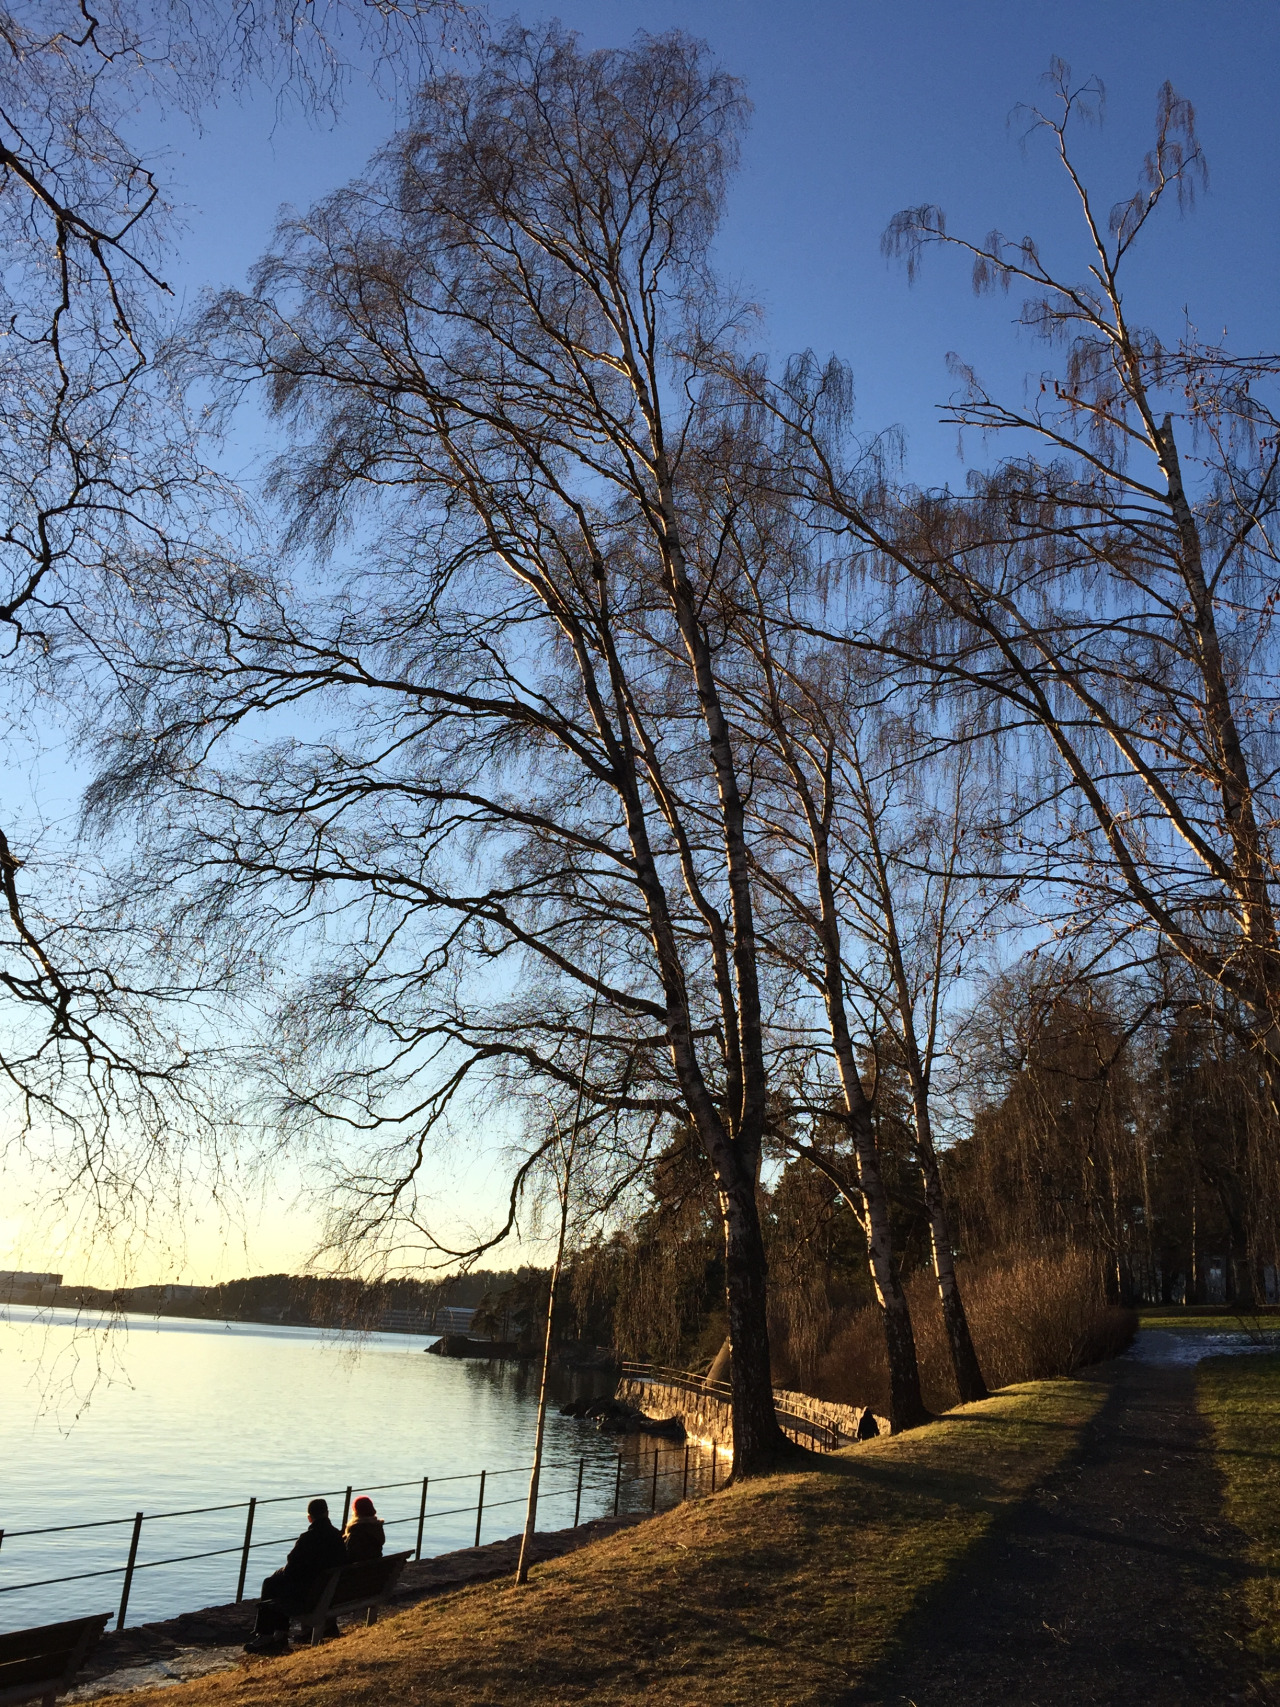 Lysaker / Vaekero, Oslo